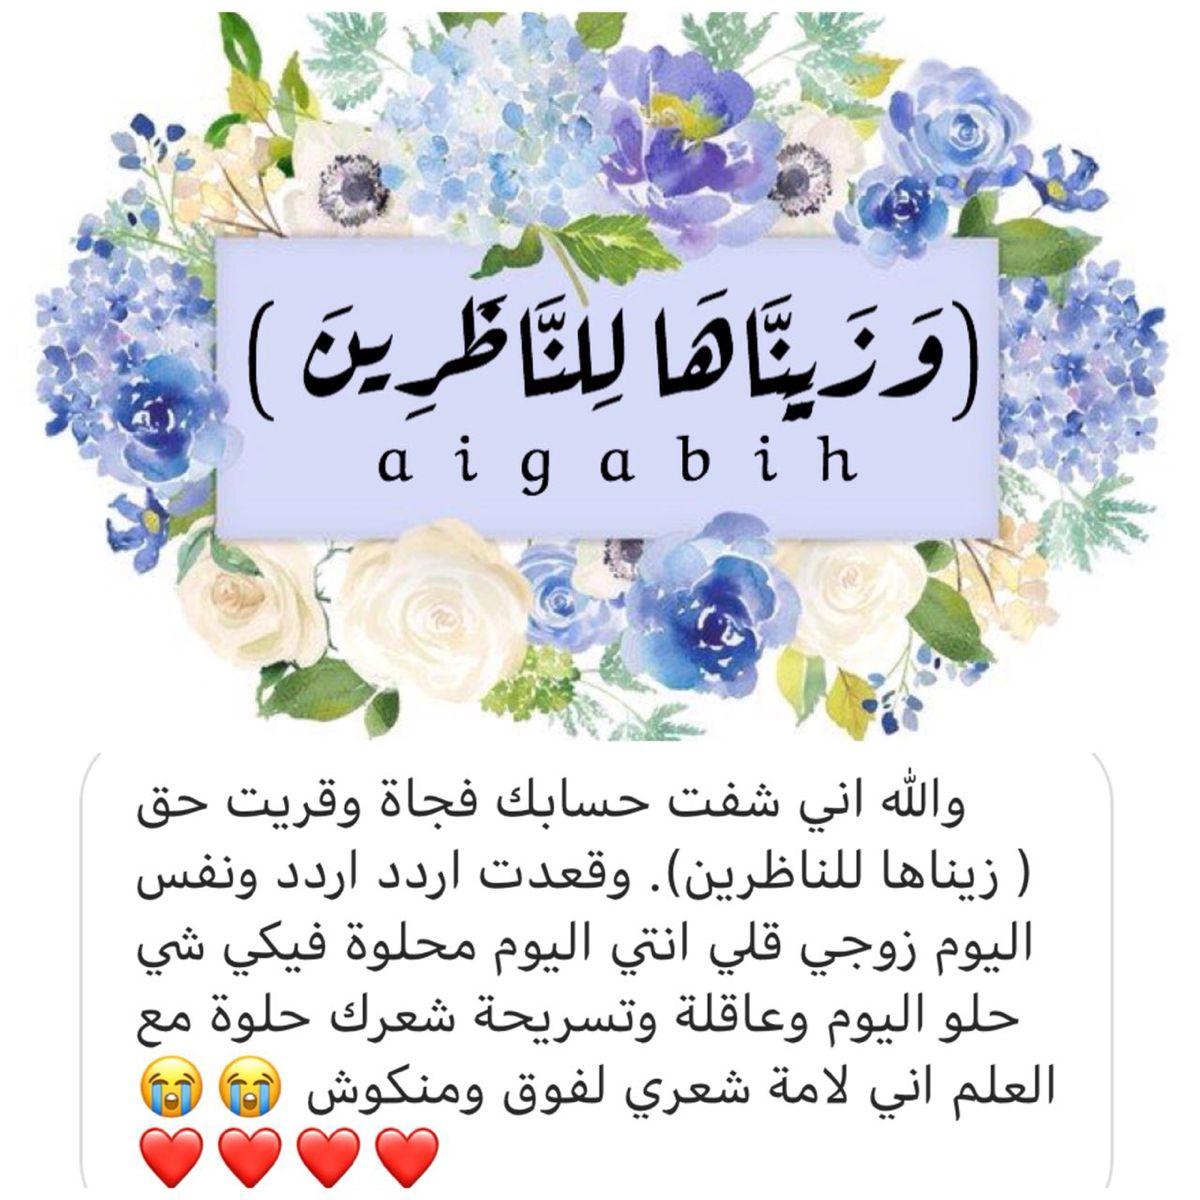 Pin By Nwayer On طاقه ايجابيه Islam Quran Quran Islam